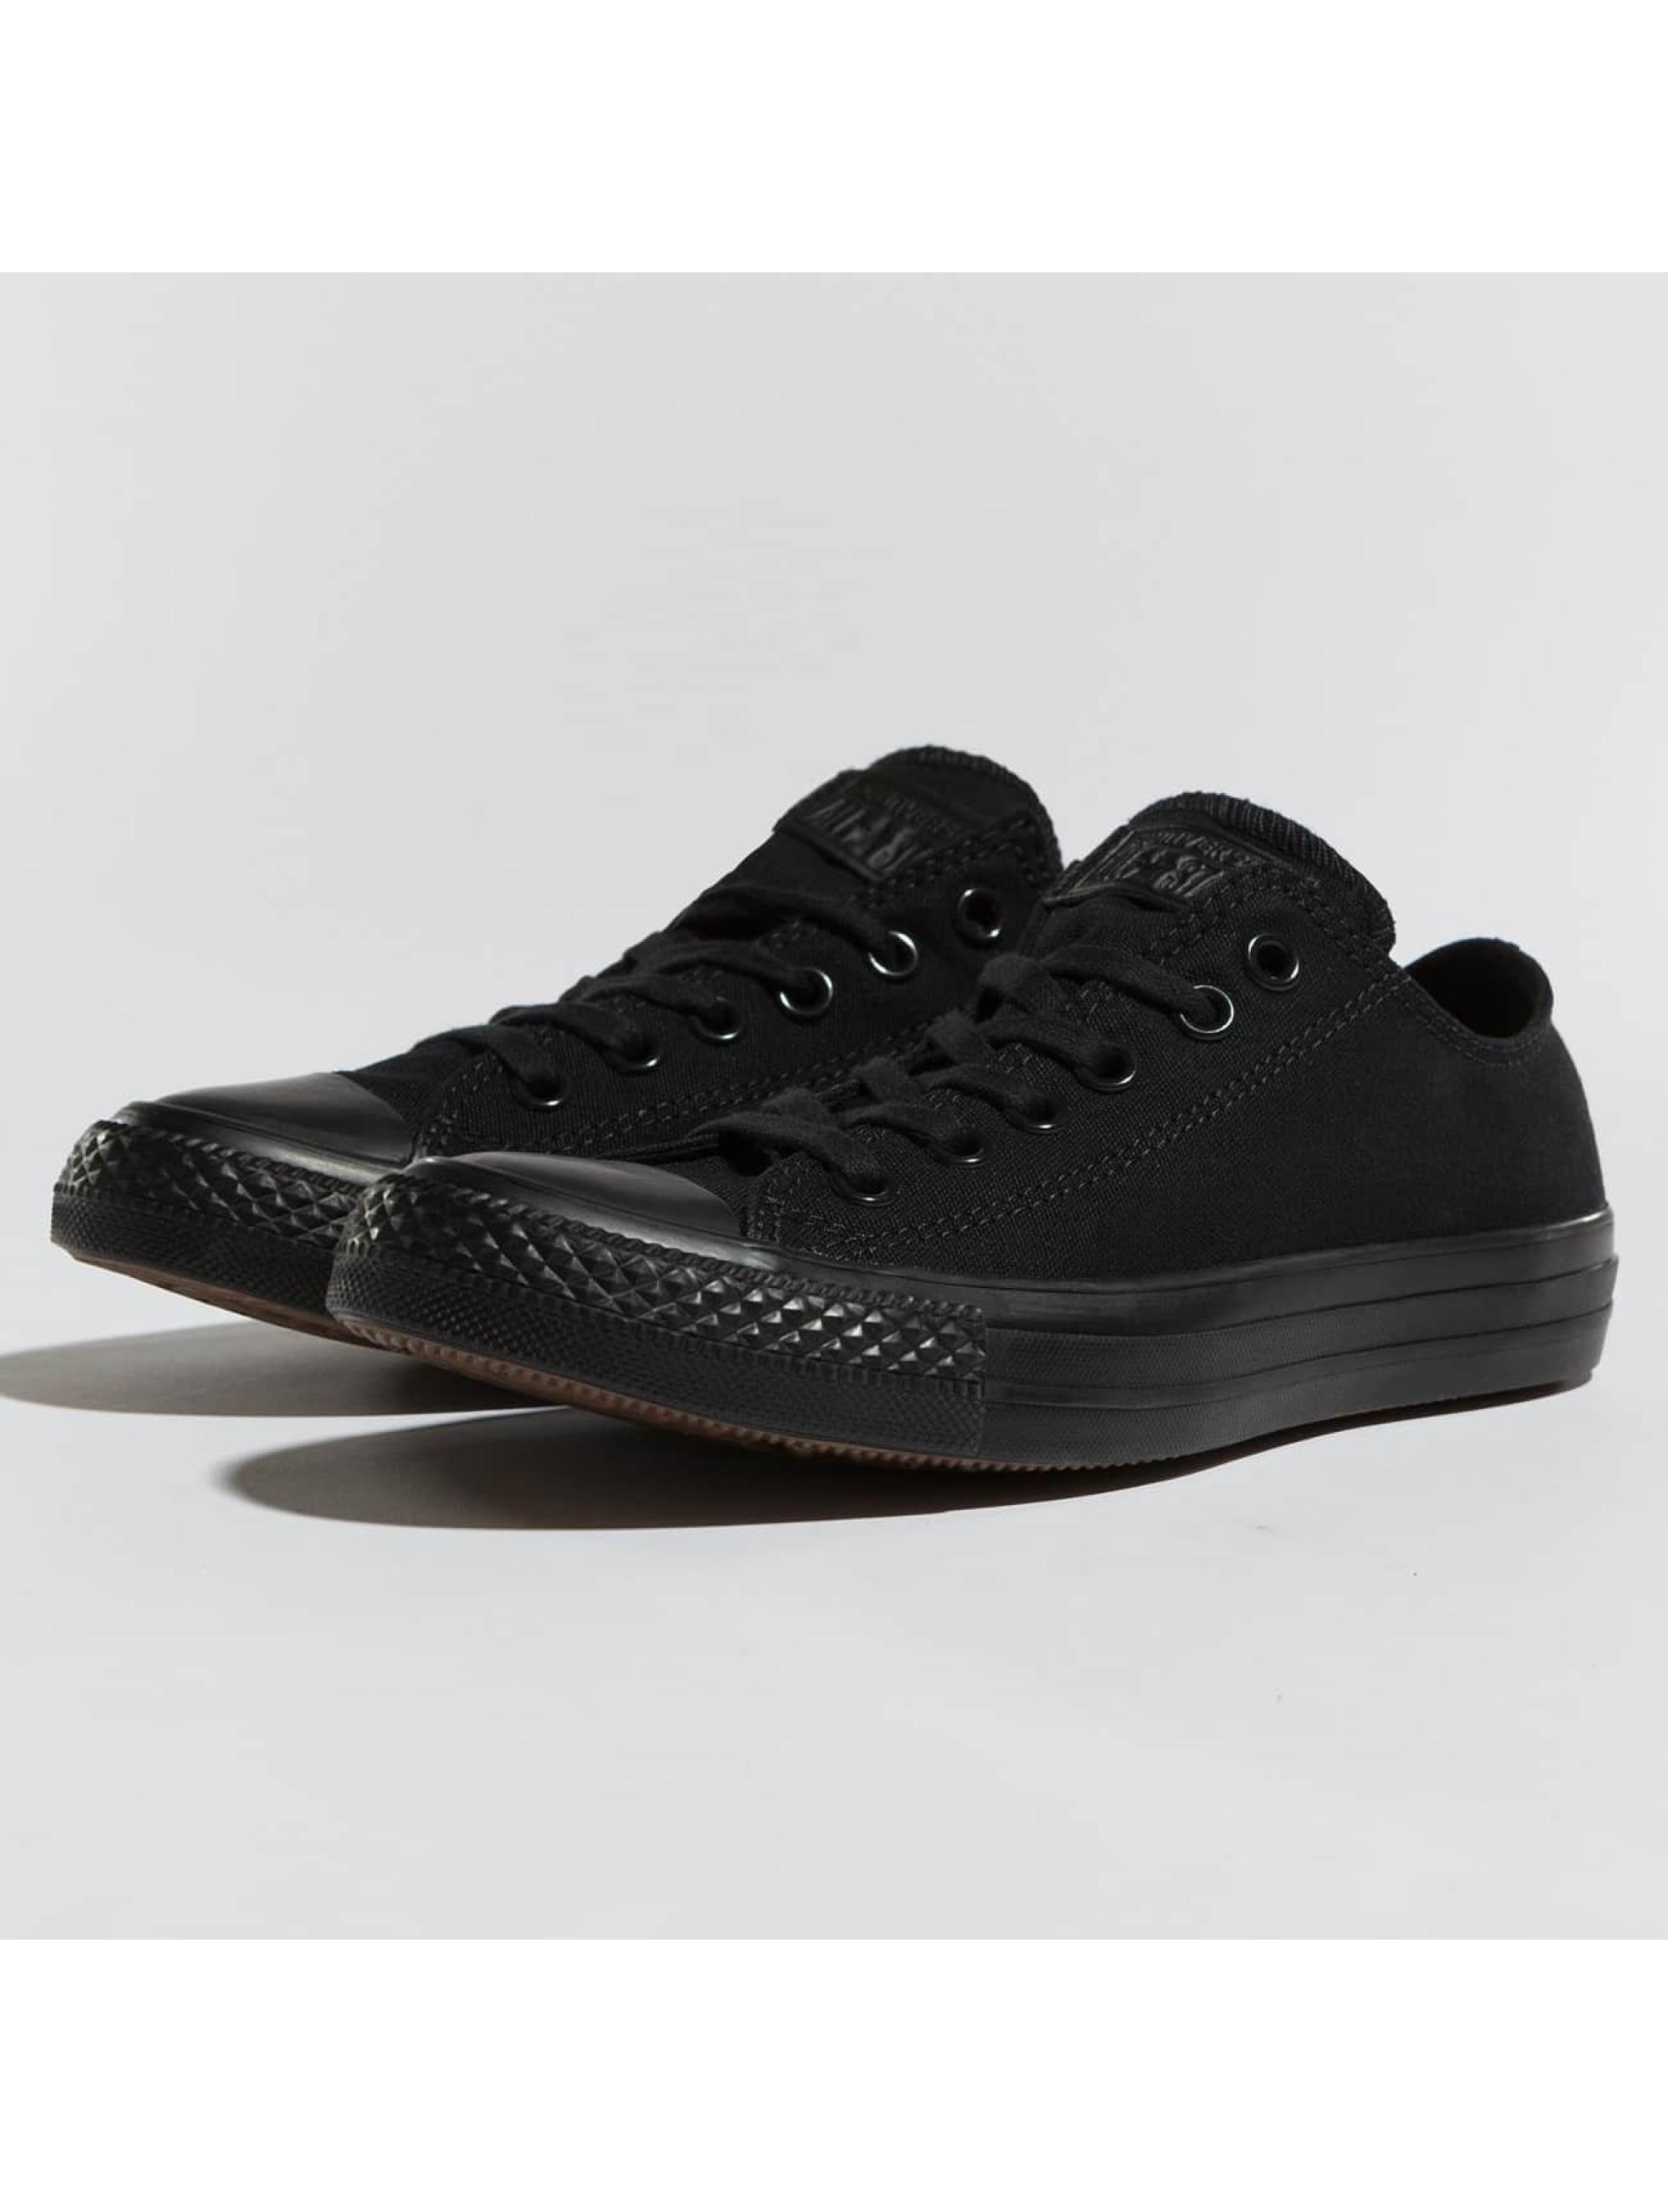 111c9592331c9d ... australia converse damen sneaker chuck taylor all star ox in schwarz  413836 cc97c 2aecd